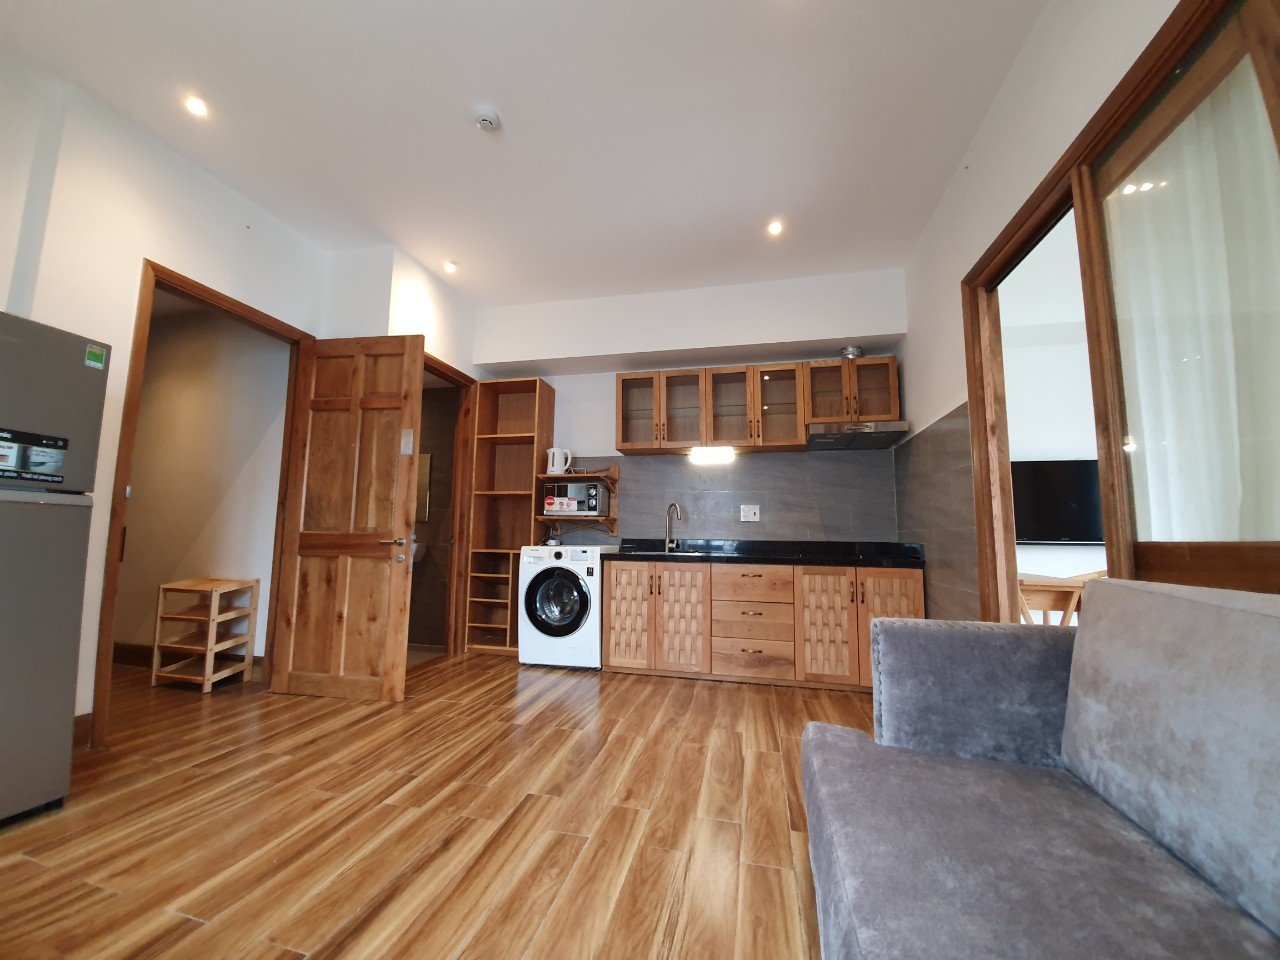 Apartment For Rent Da Nang near the beach – Beautiful Japanese style